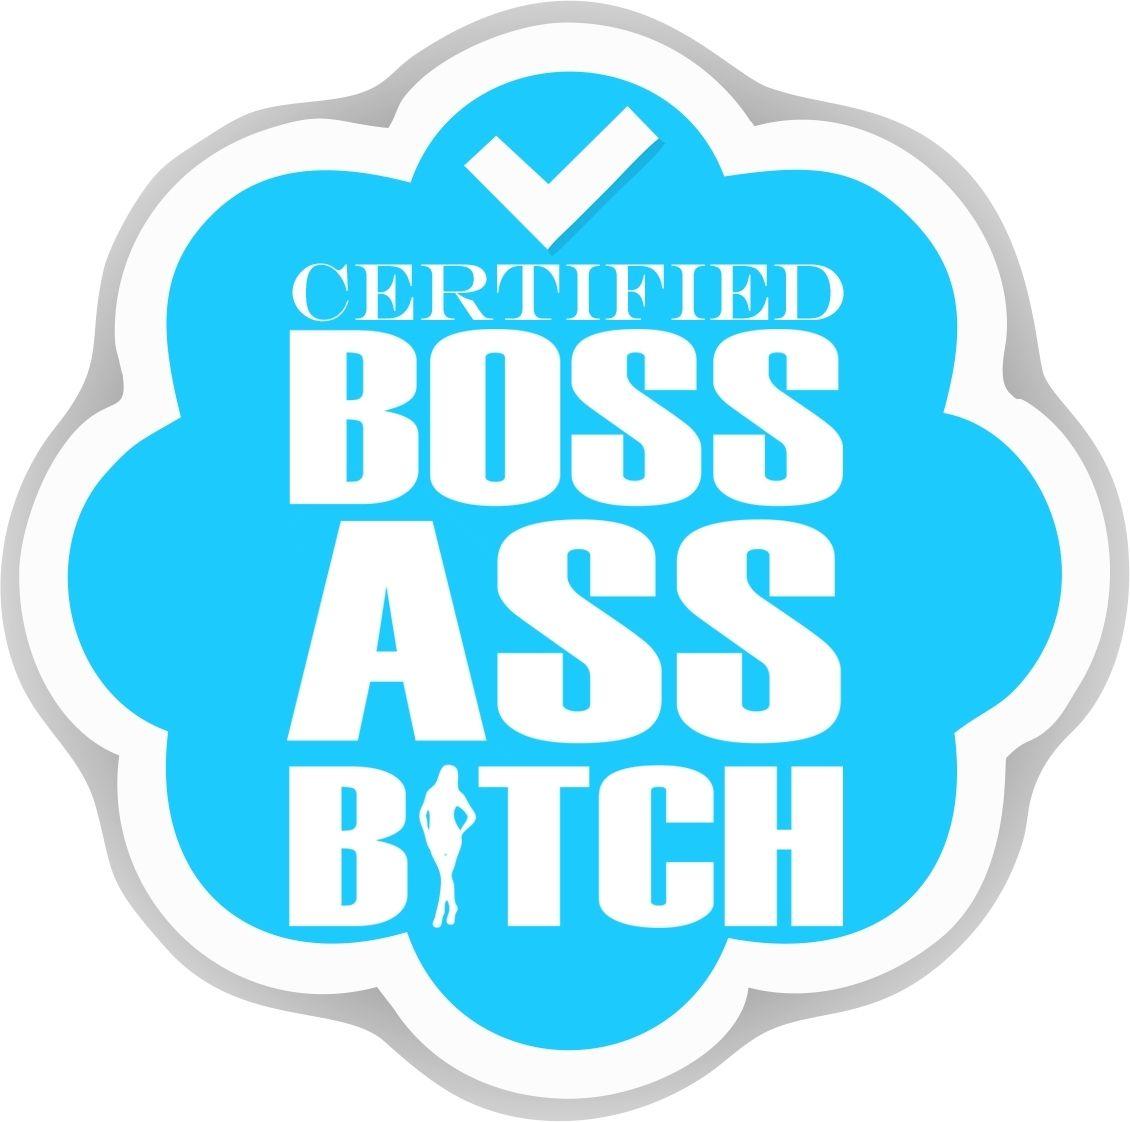 BossAssBitch_Certified_logo